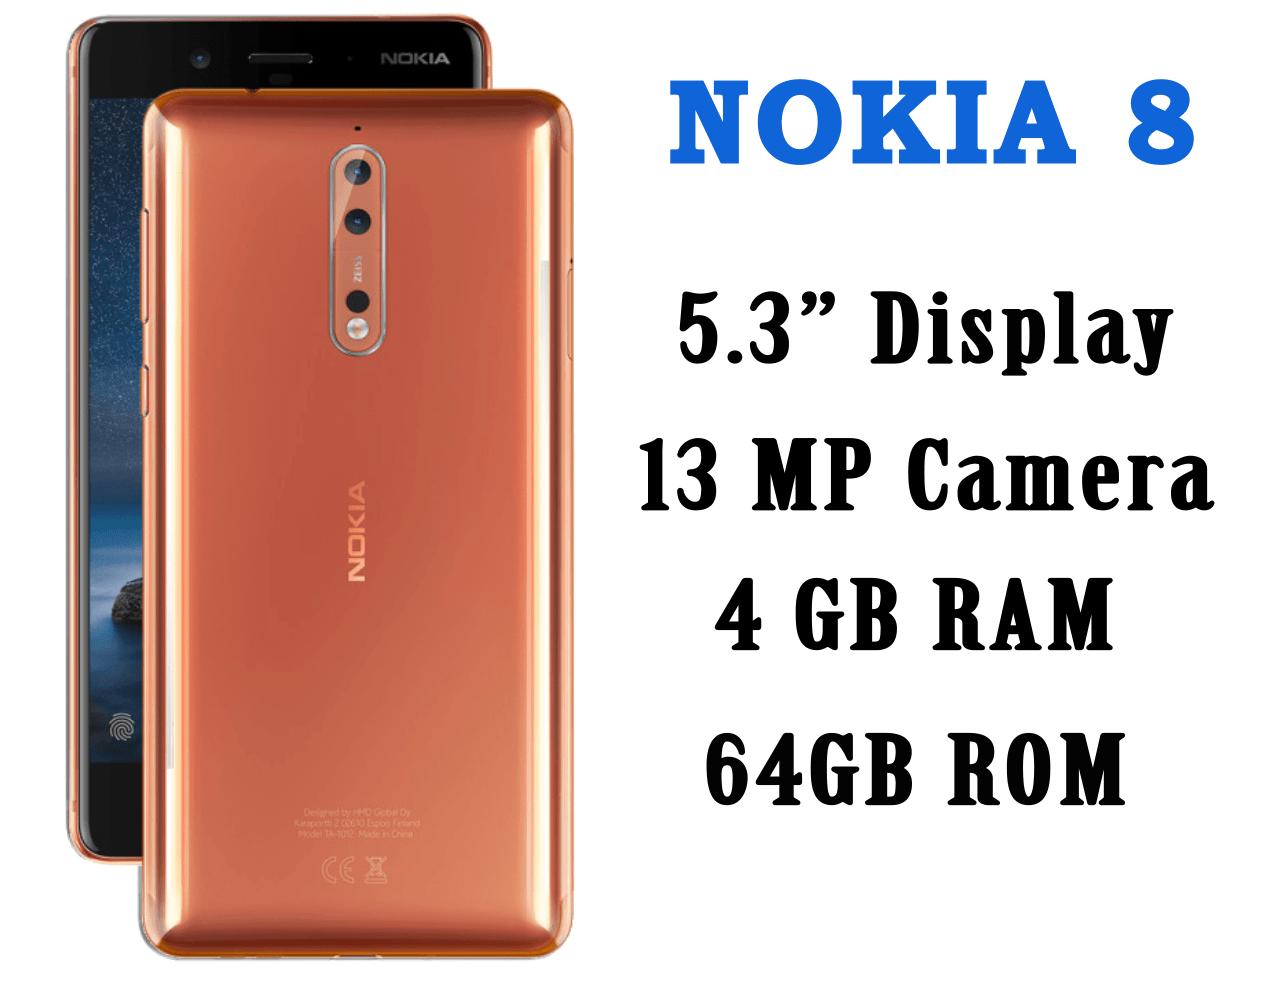 nokia 8 , nokia 8 images, nokia 8 specifications